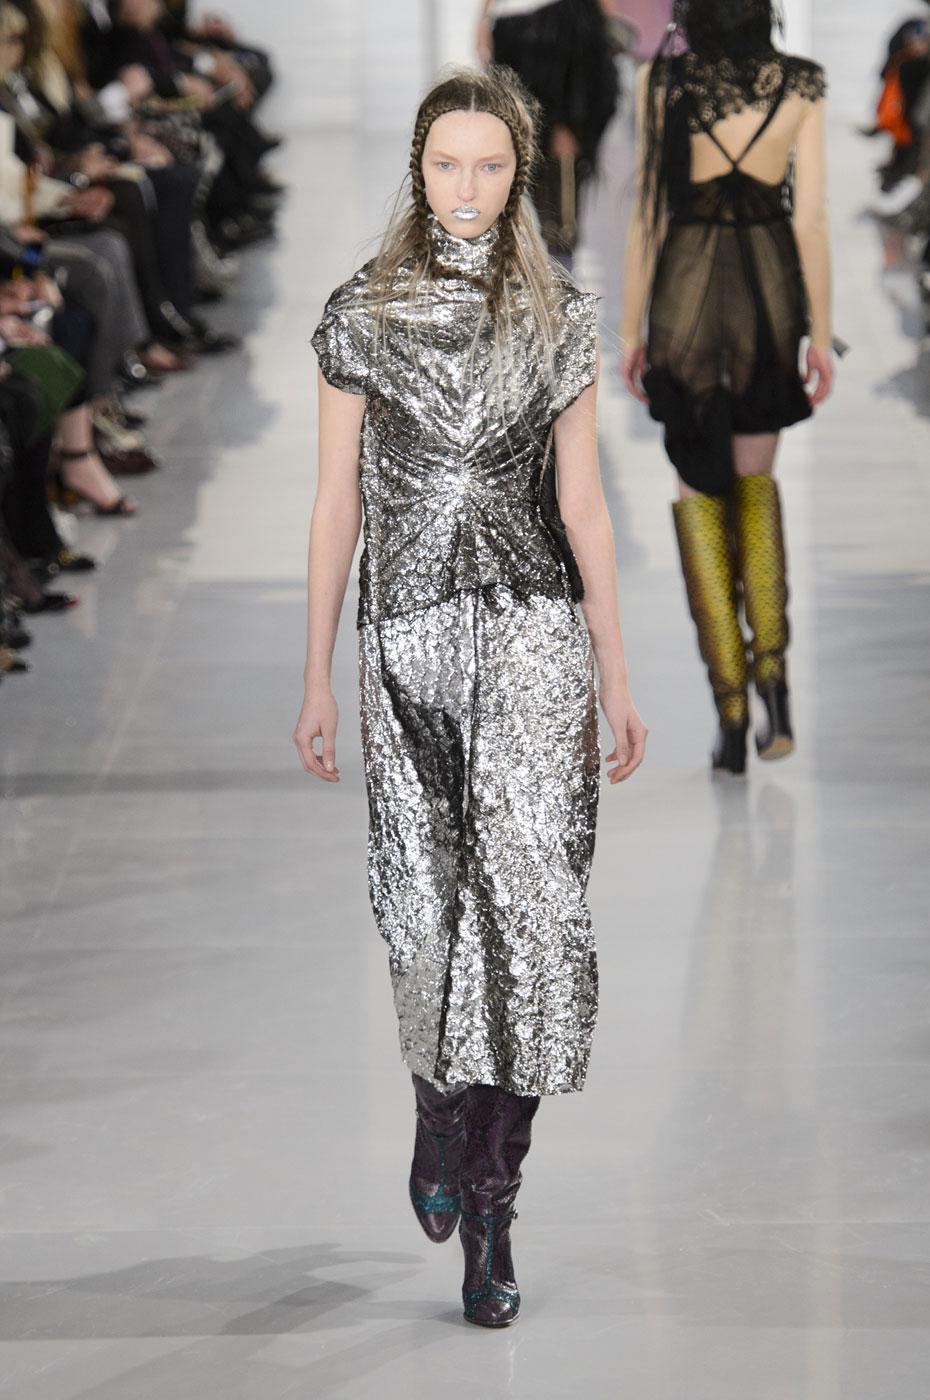 Maison Margiela Embraces Absurdism for Spring 2016 Couture ...